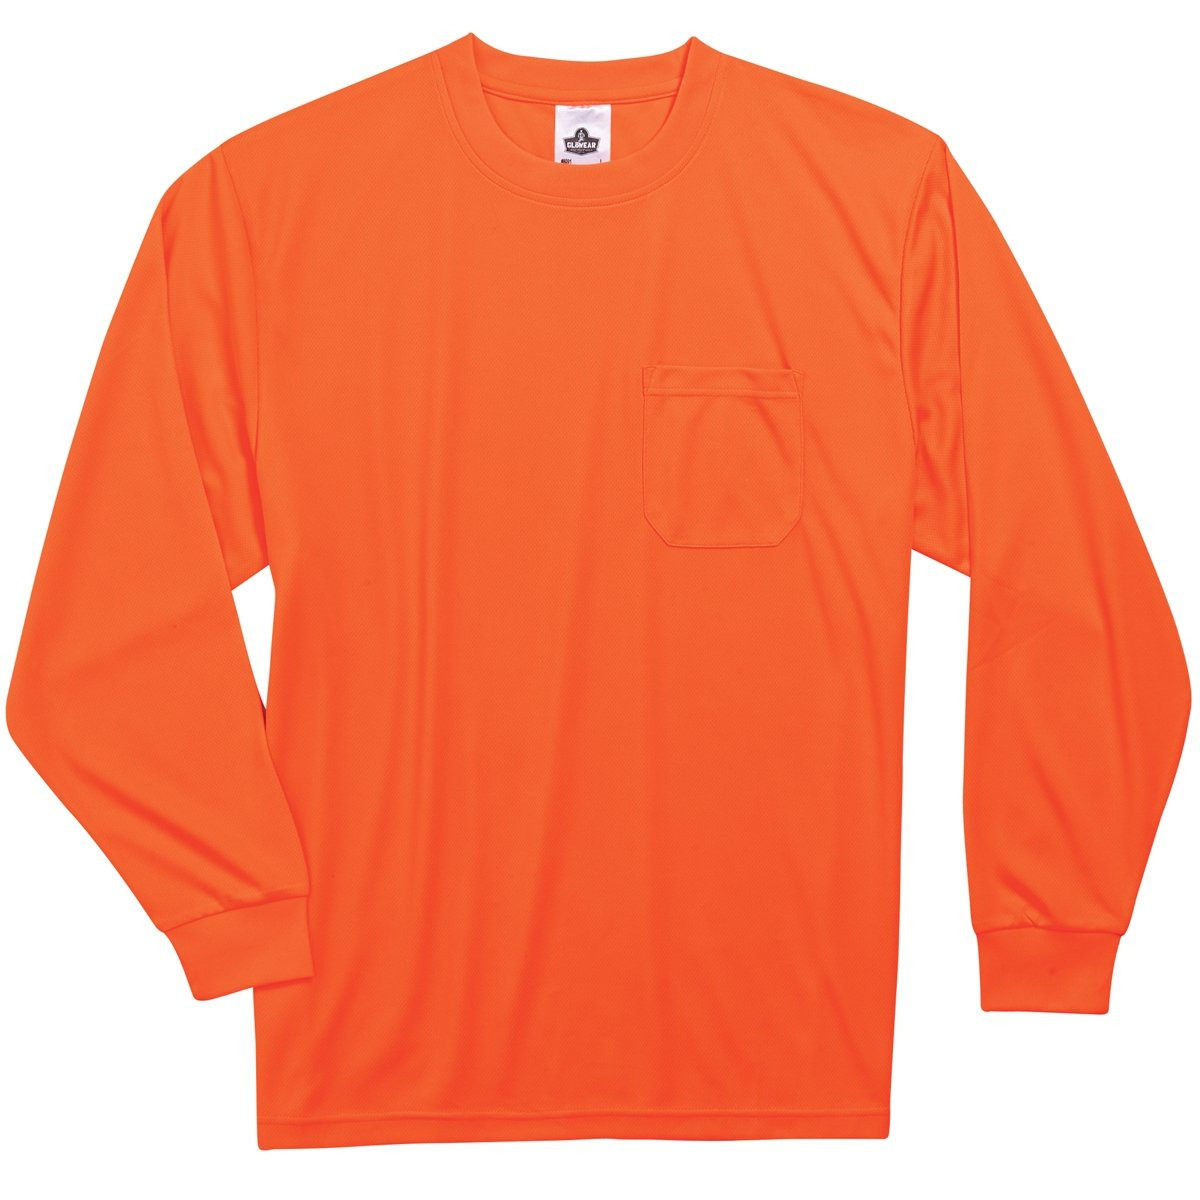 Ergodyne GloWear 8091 Non-Certified Long Sleeve High Visibility T-Shirt, 4X-Large, Orange